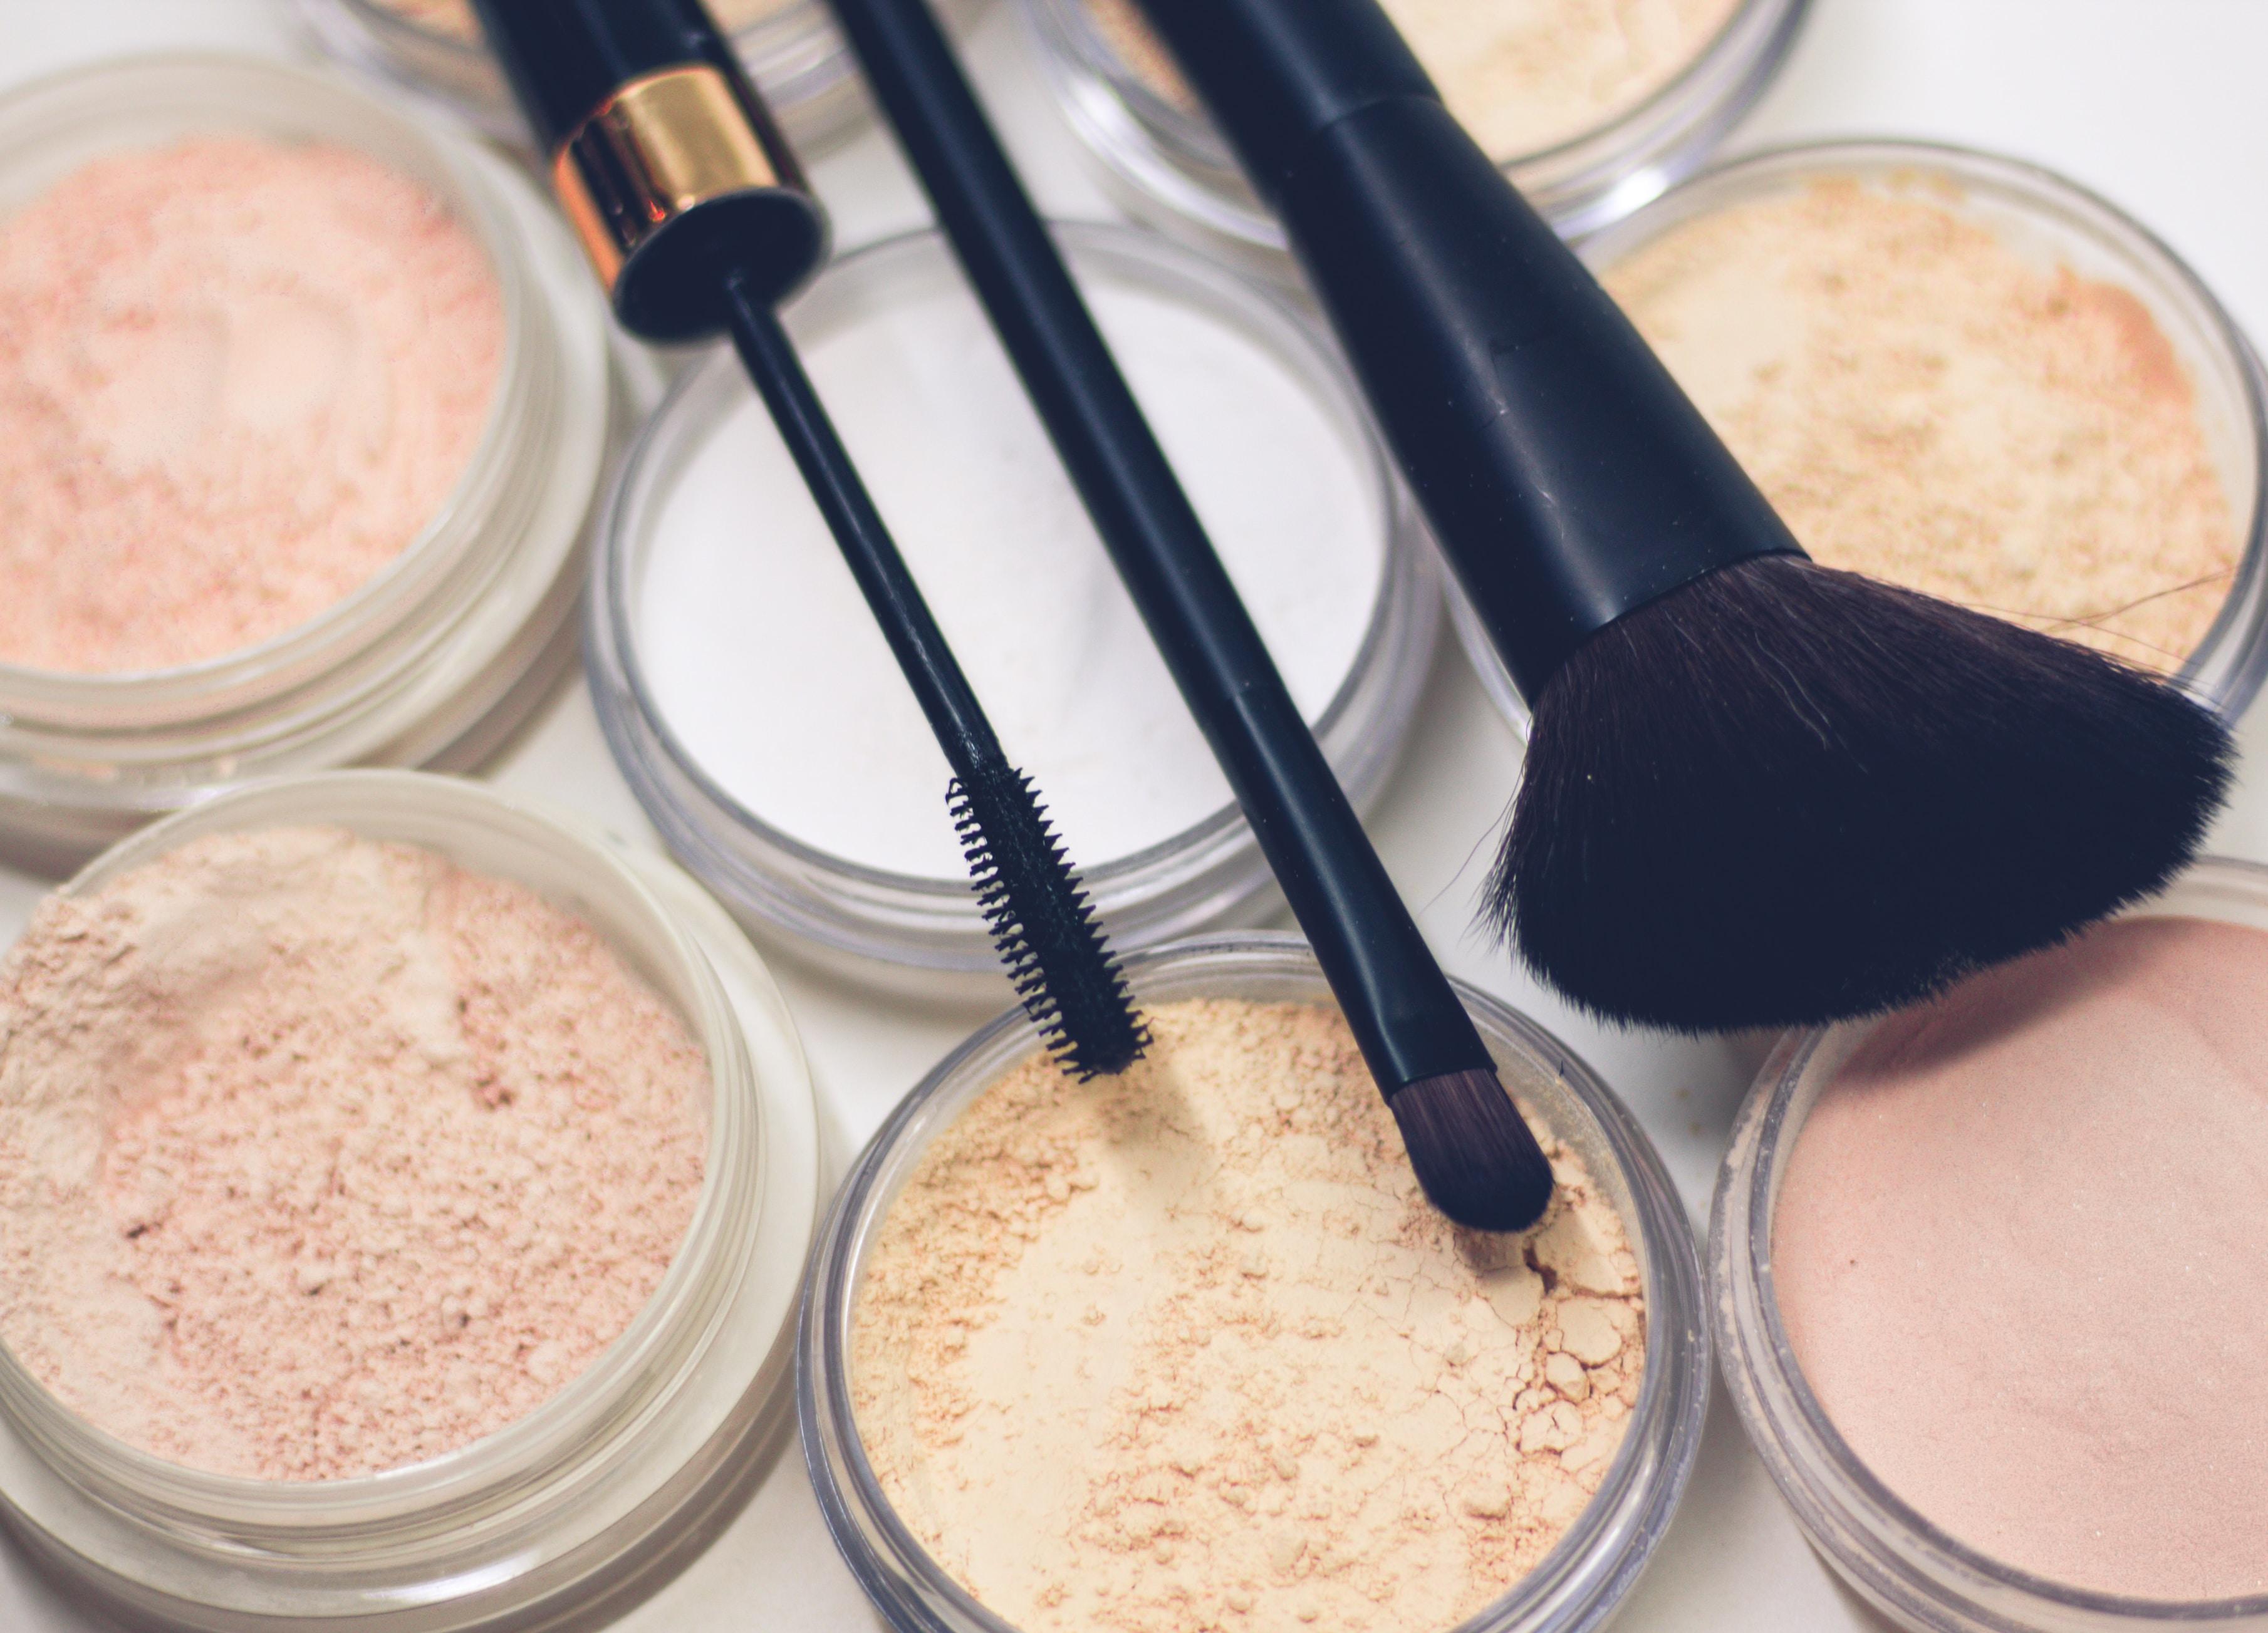 Steps to Radiant, Mature Skin